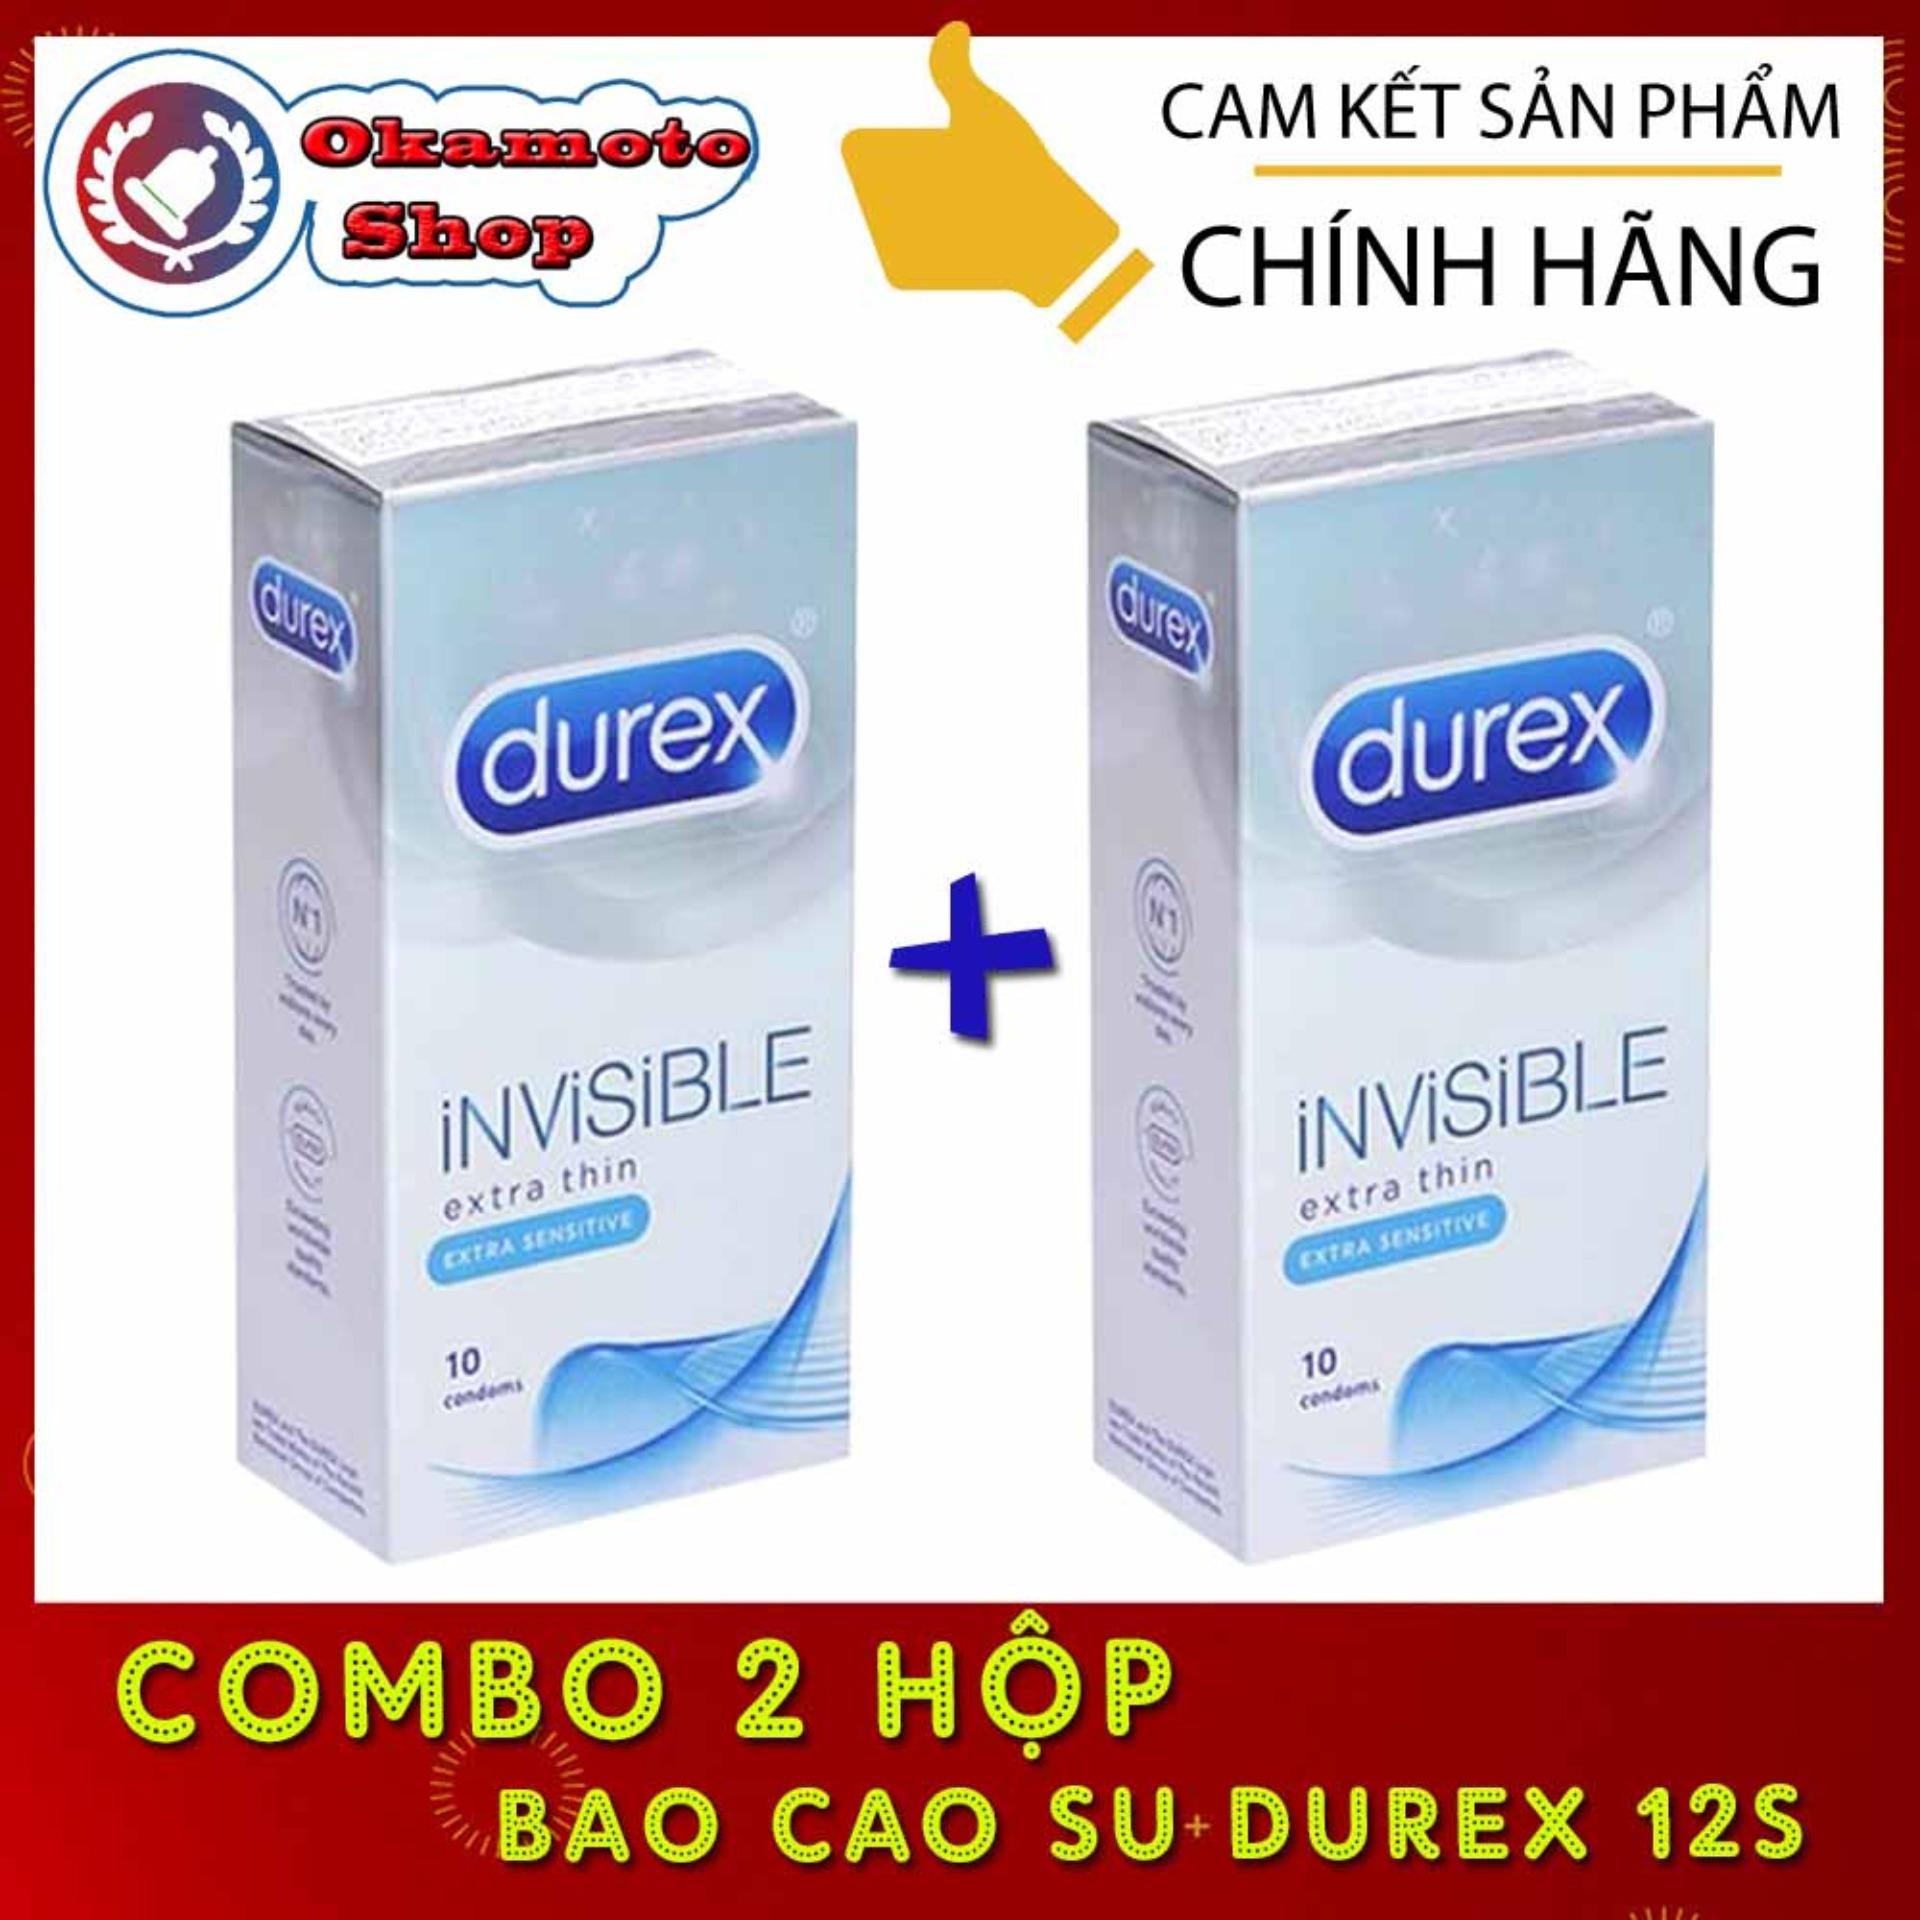 [Combo 2 hộp] Bao cao su Durex Invisible Extra Thin cực siêu mỏng (Hộp 10 chiếc)